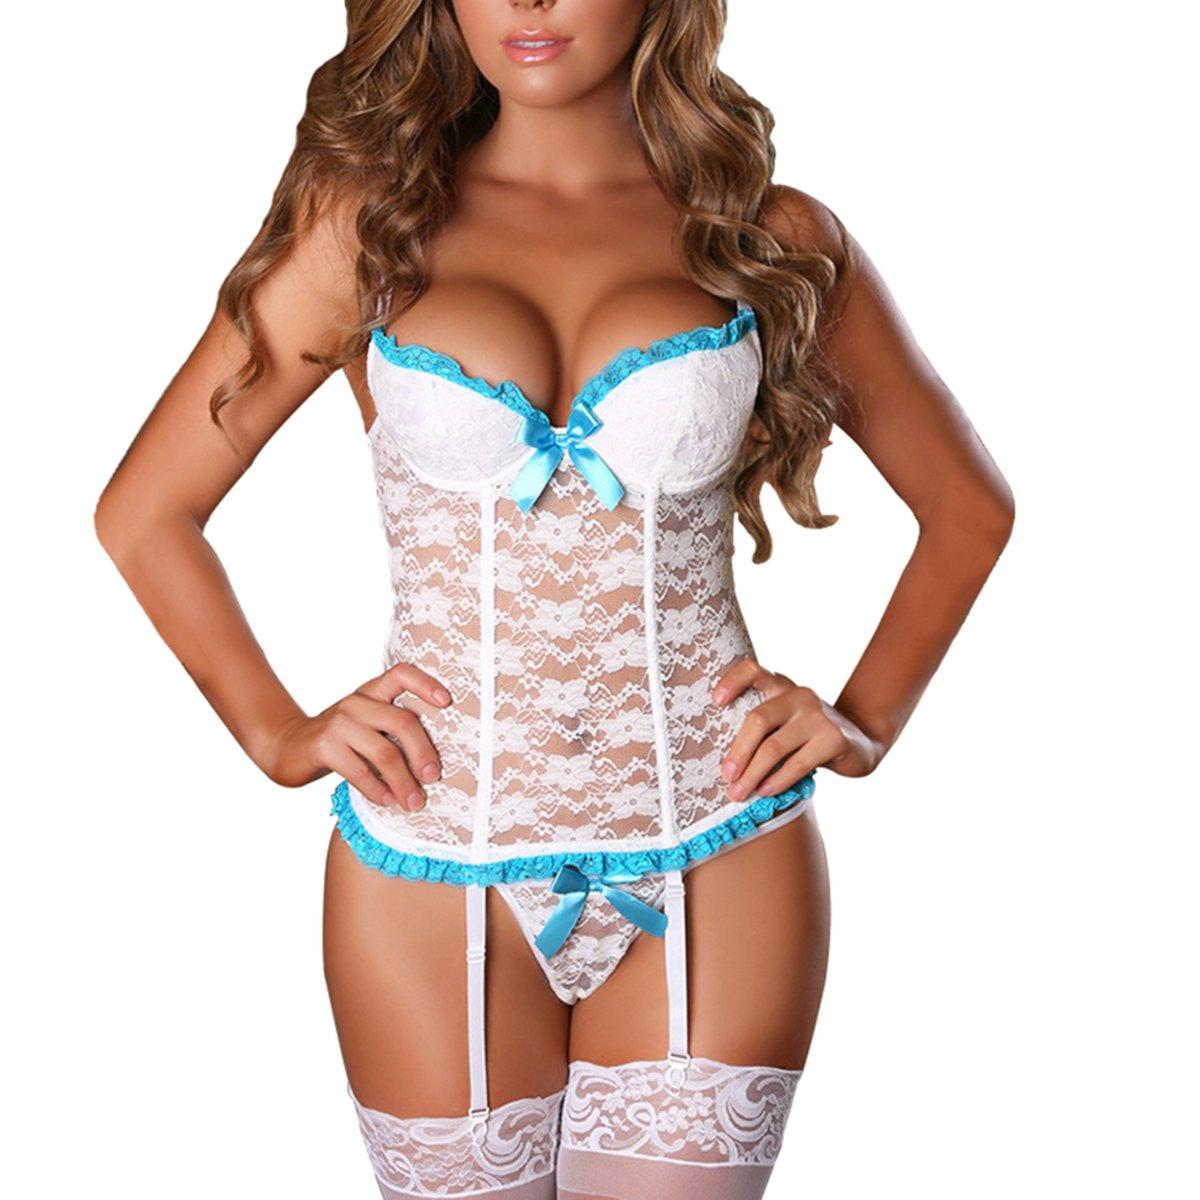 EVAbaby Plus Size Sexy Corset Lingerie Set Women Sex Exotic Wedding Garter Belt Floral Lace Sleepwear White S